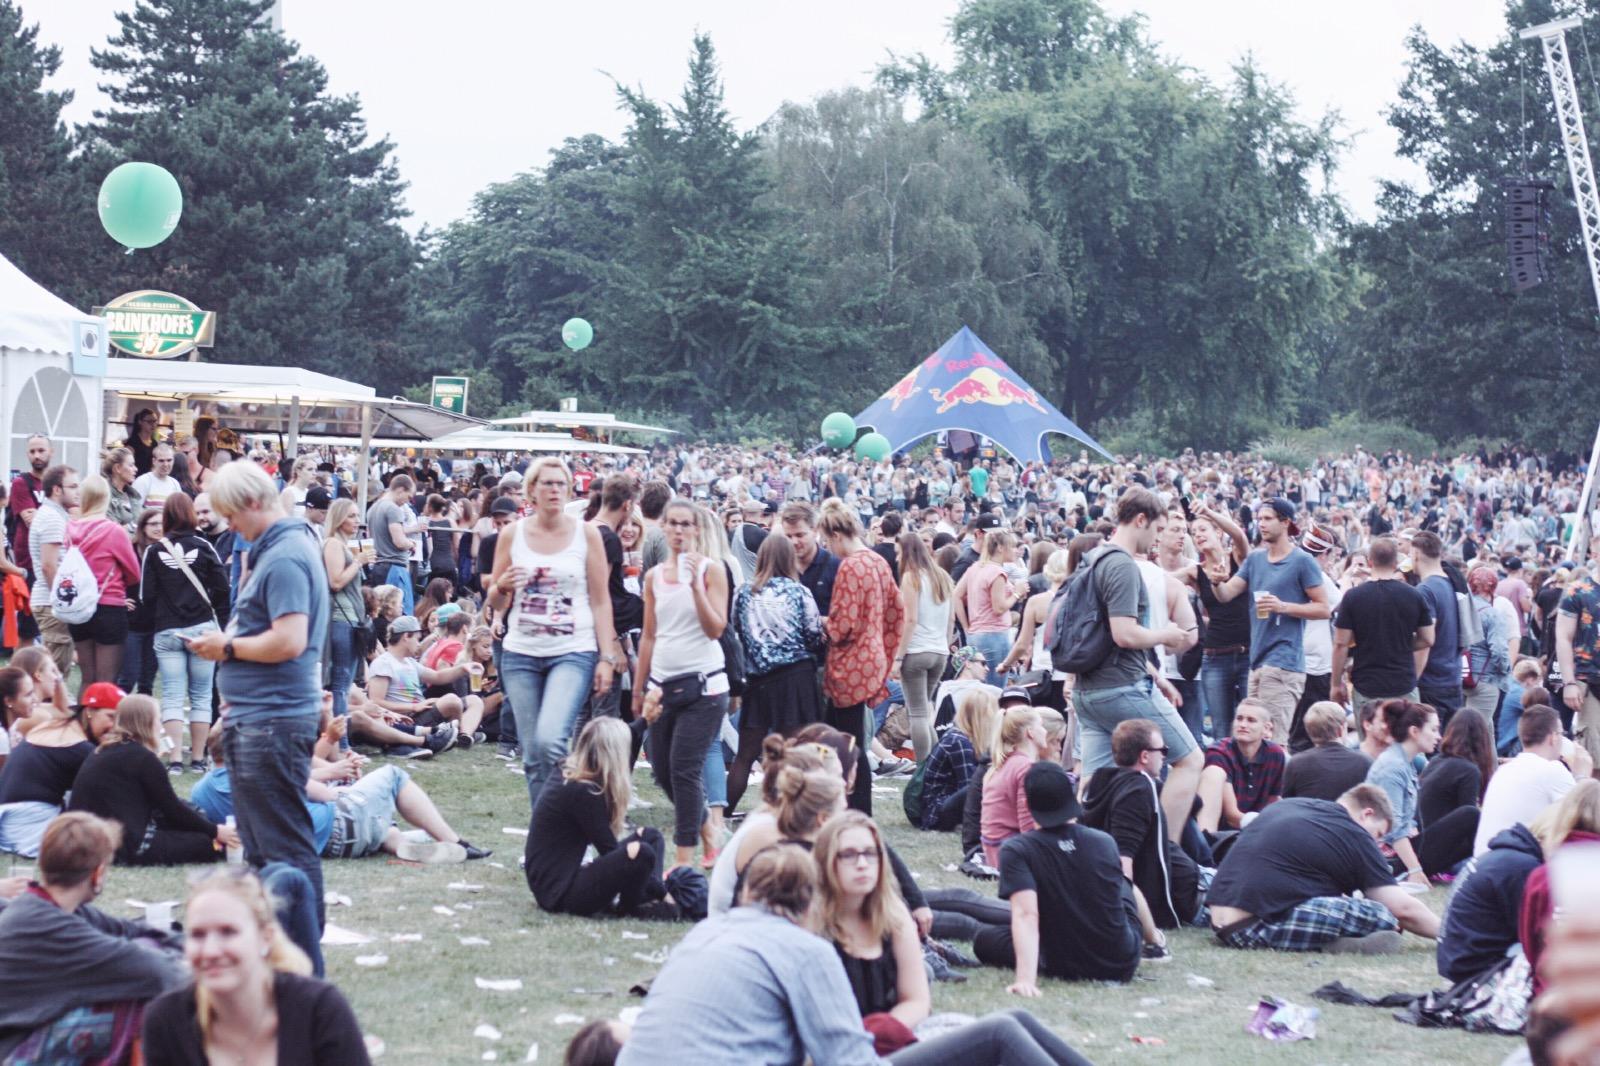 festival_juicy_beats_dortmund_radisson_blu_itsgoldie_reiseblogger_travelblogger_festival_festivalstyle_festivalguide